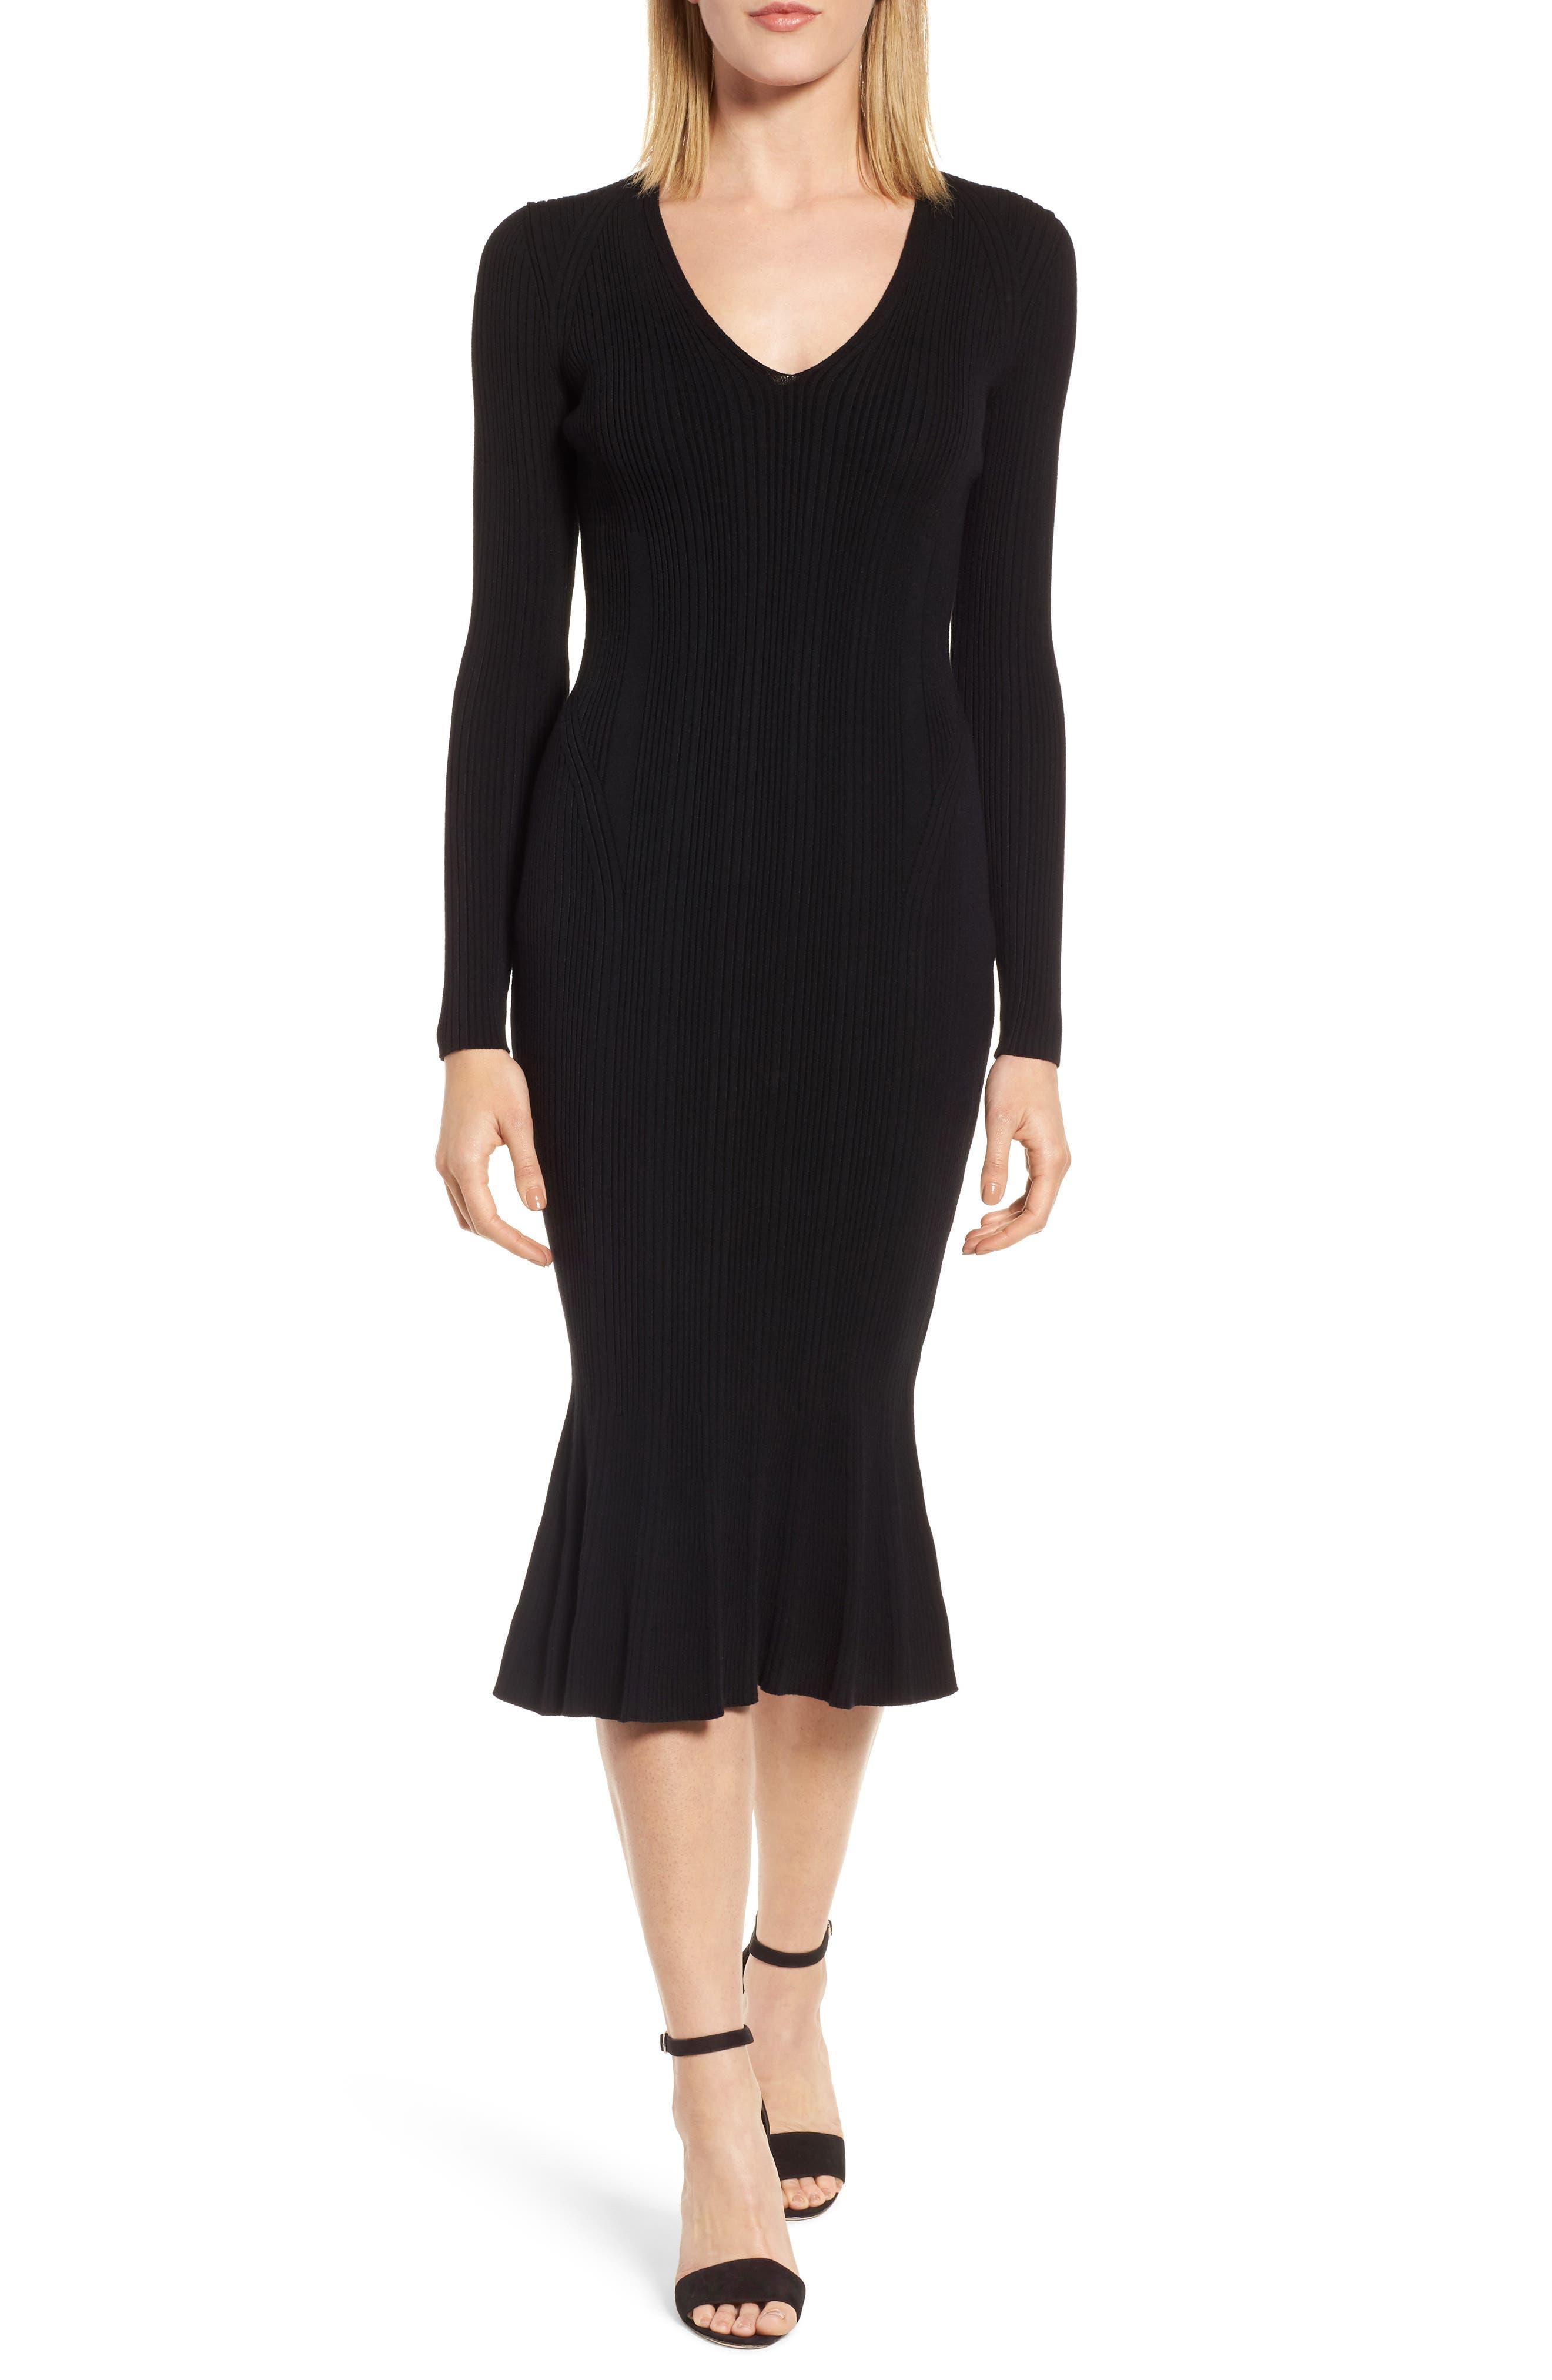 Alternate Image 1 Selected - BOSS Ribbed Knit Midi Dress